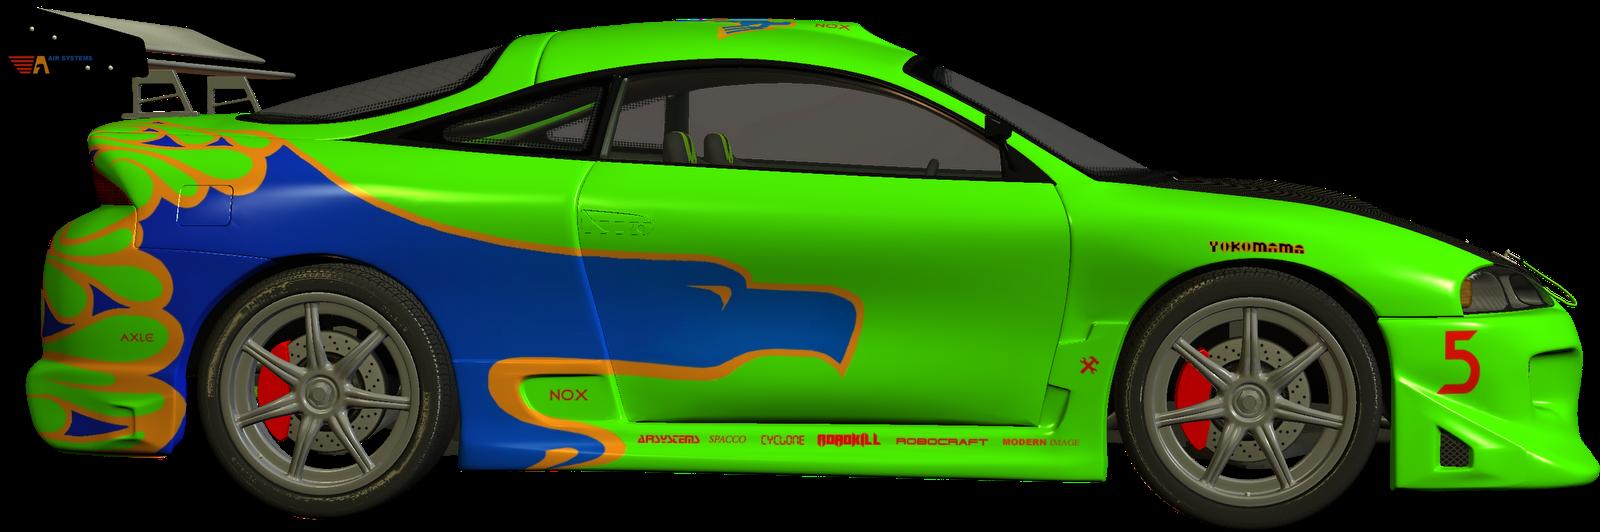 Ferarri clipart car toy #7